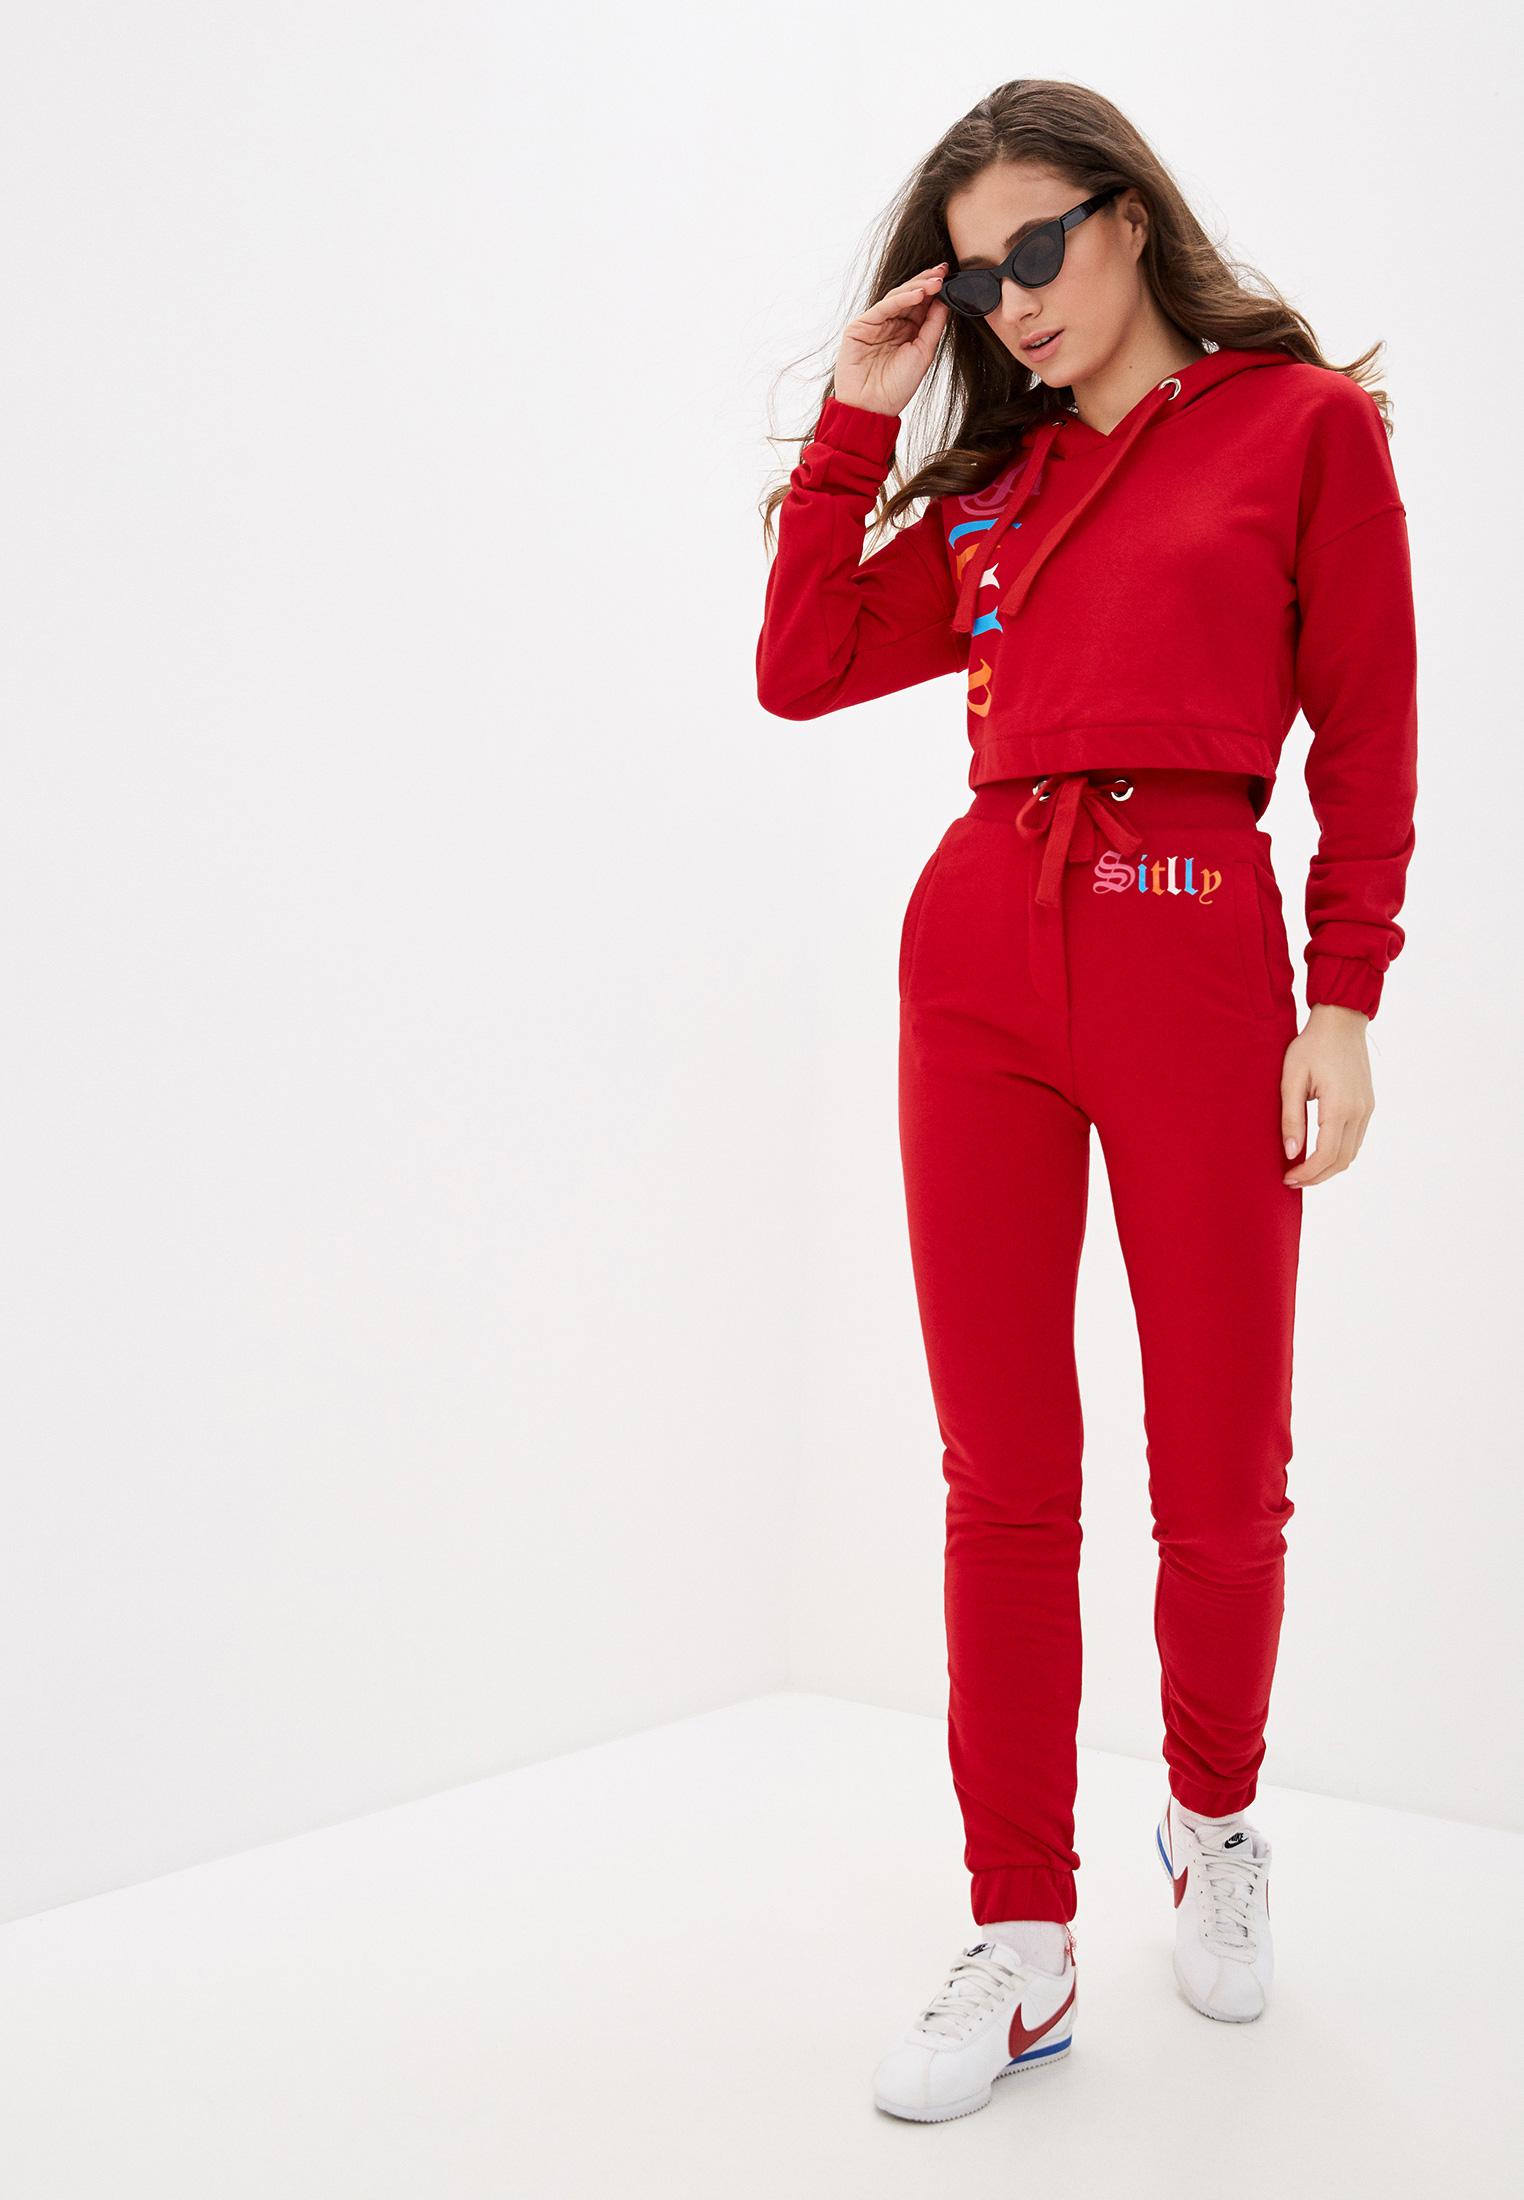 Спортивный костюм Sitlly 20313